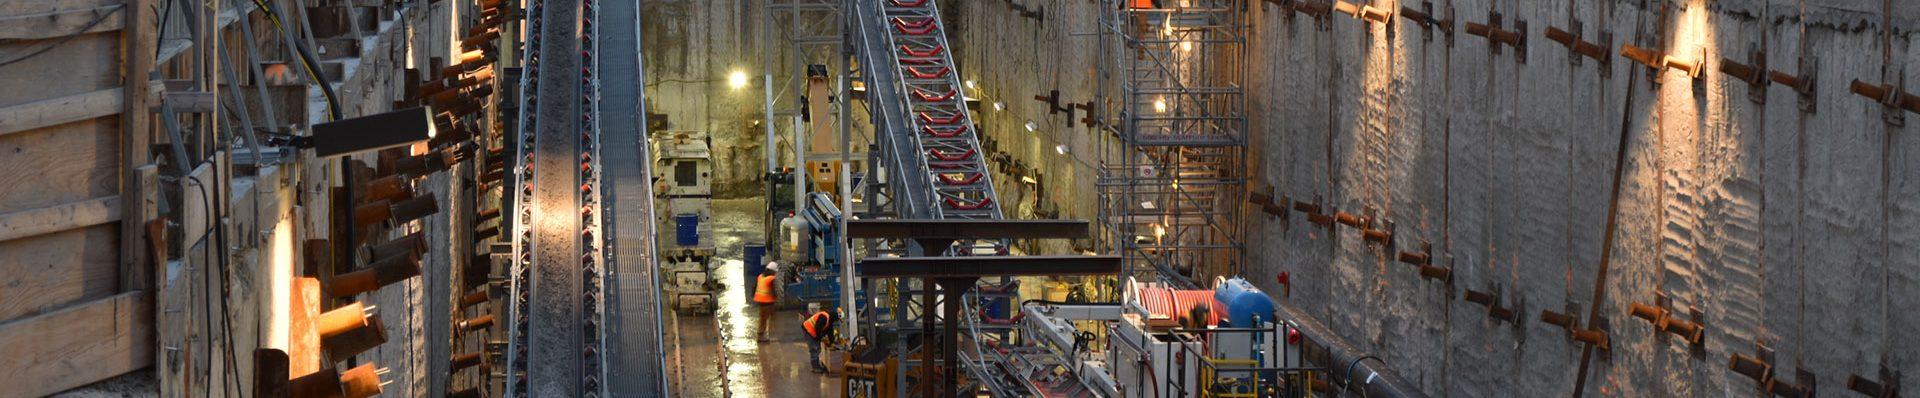 Empresa de diseño geotécnico de túneles. Empresa de disseny geotècnic de túnels. Tunnel geotechnical design company.